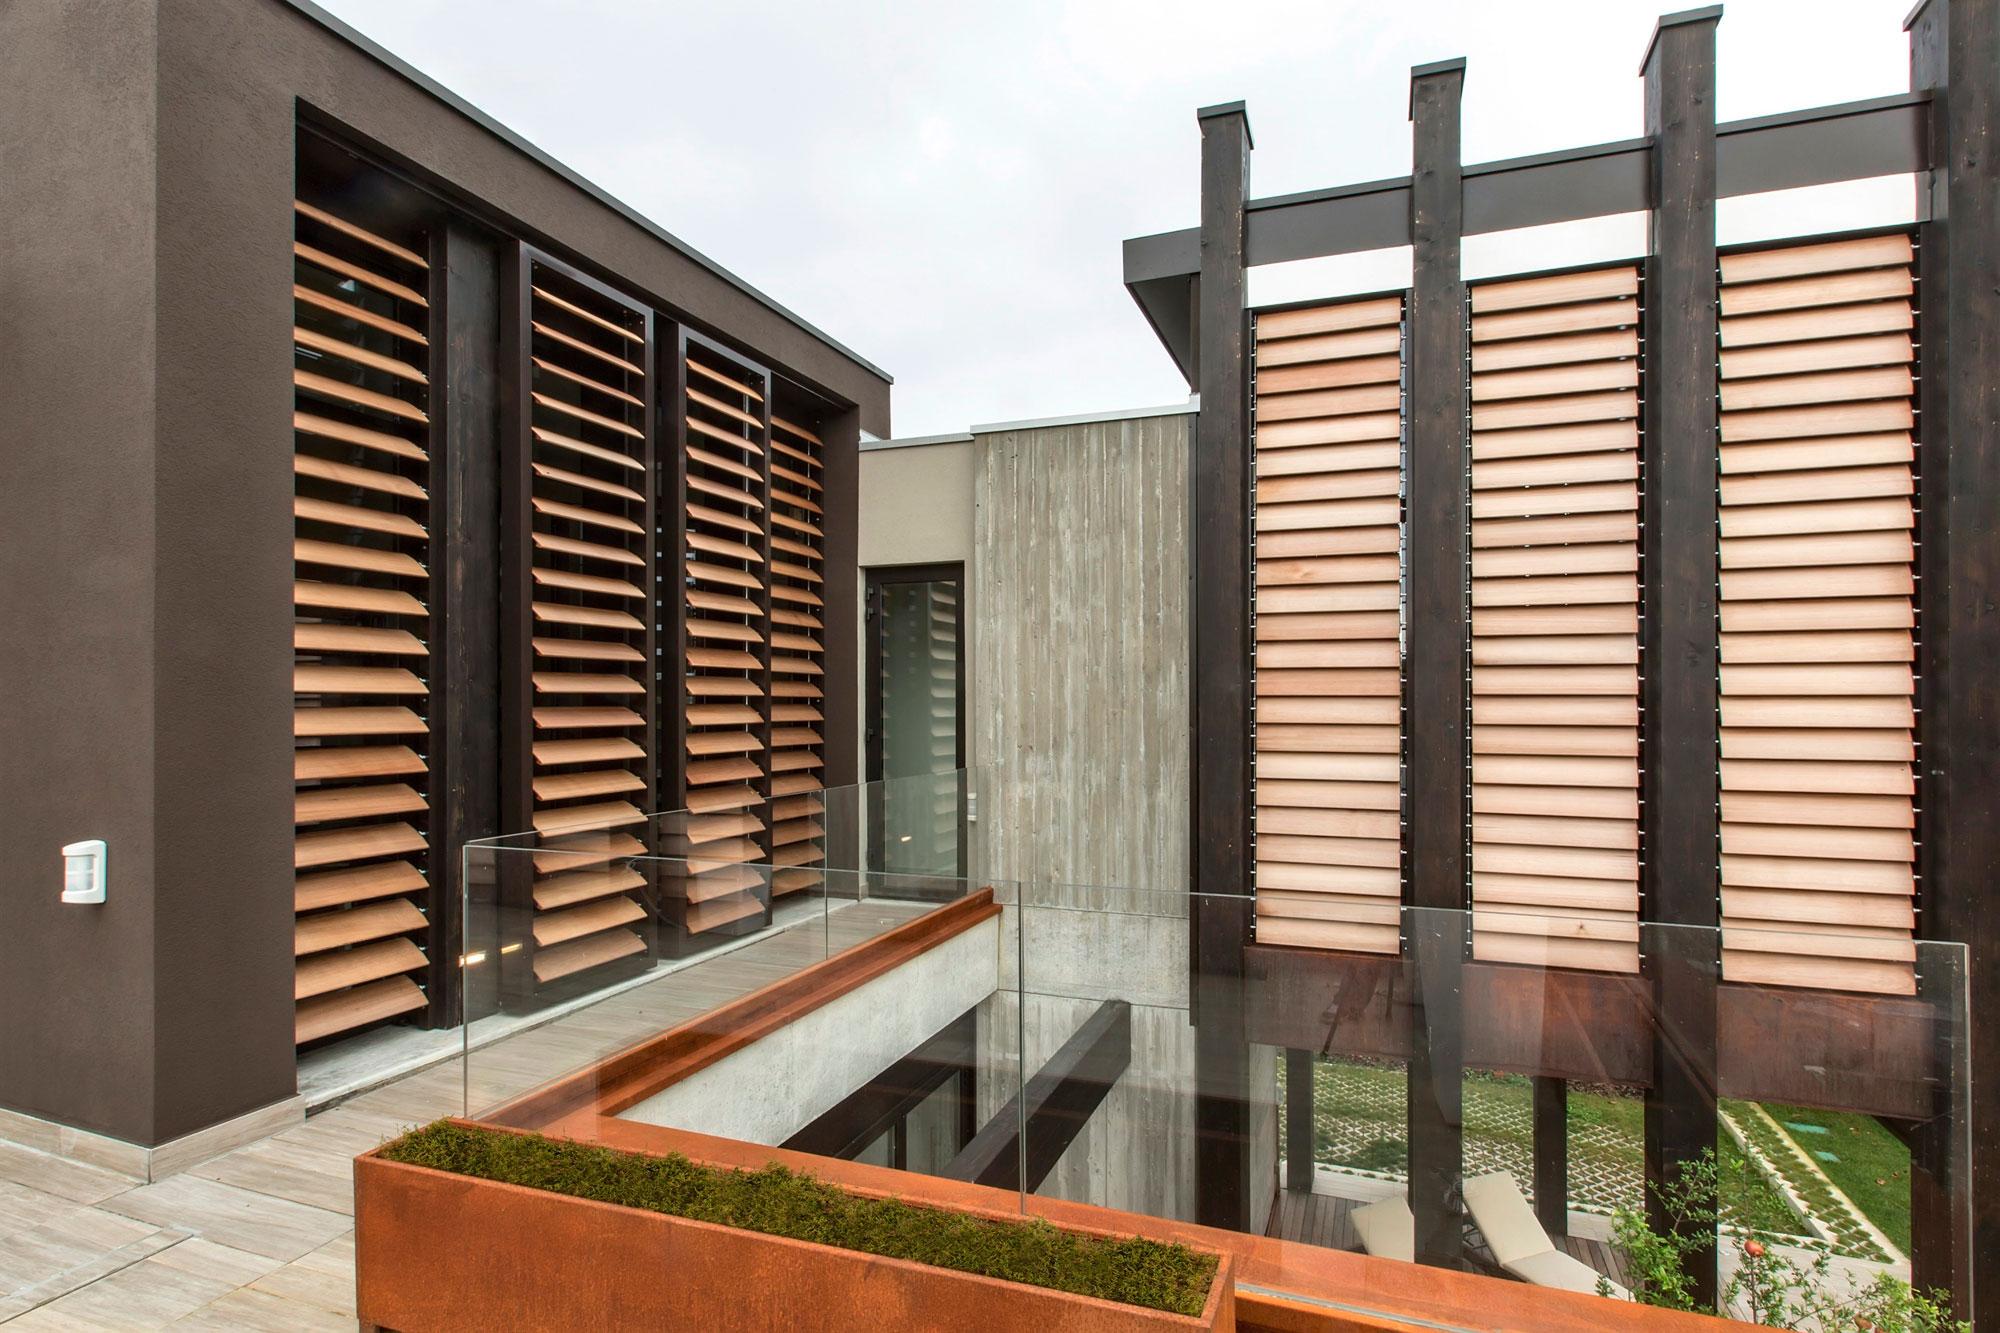 D'Autore Residence near Bologna by Giraldi Associati Architetti-09